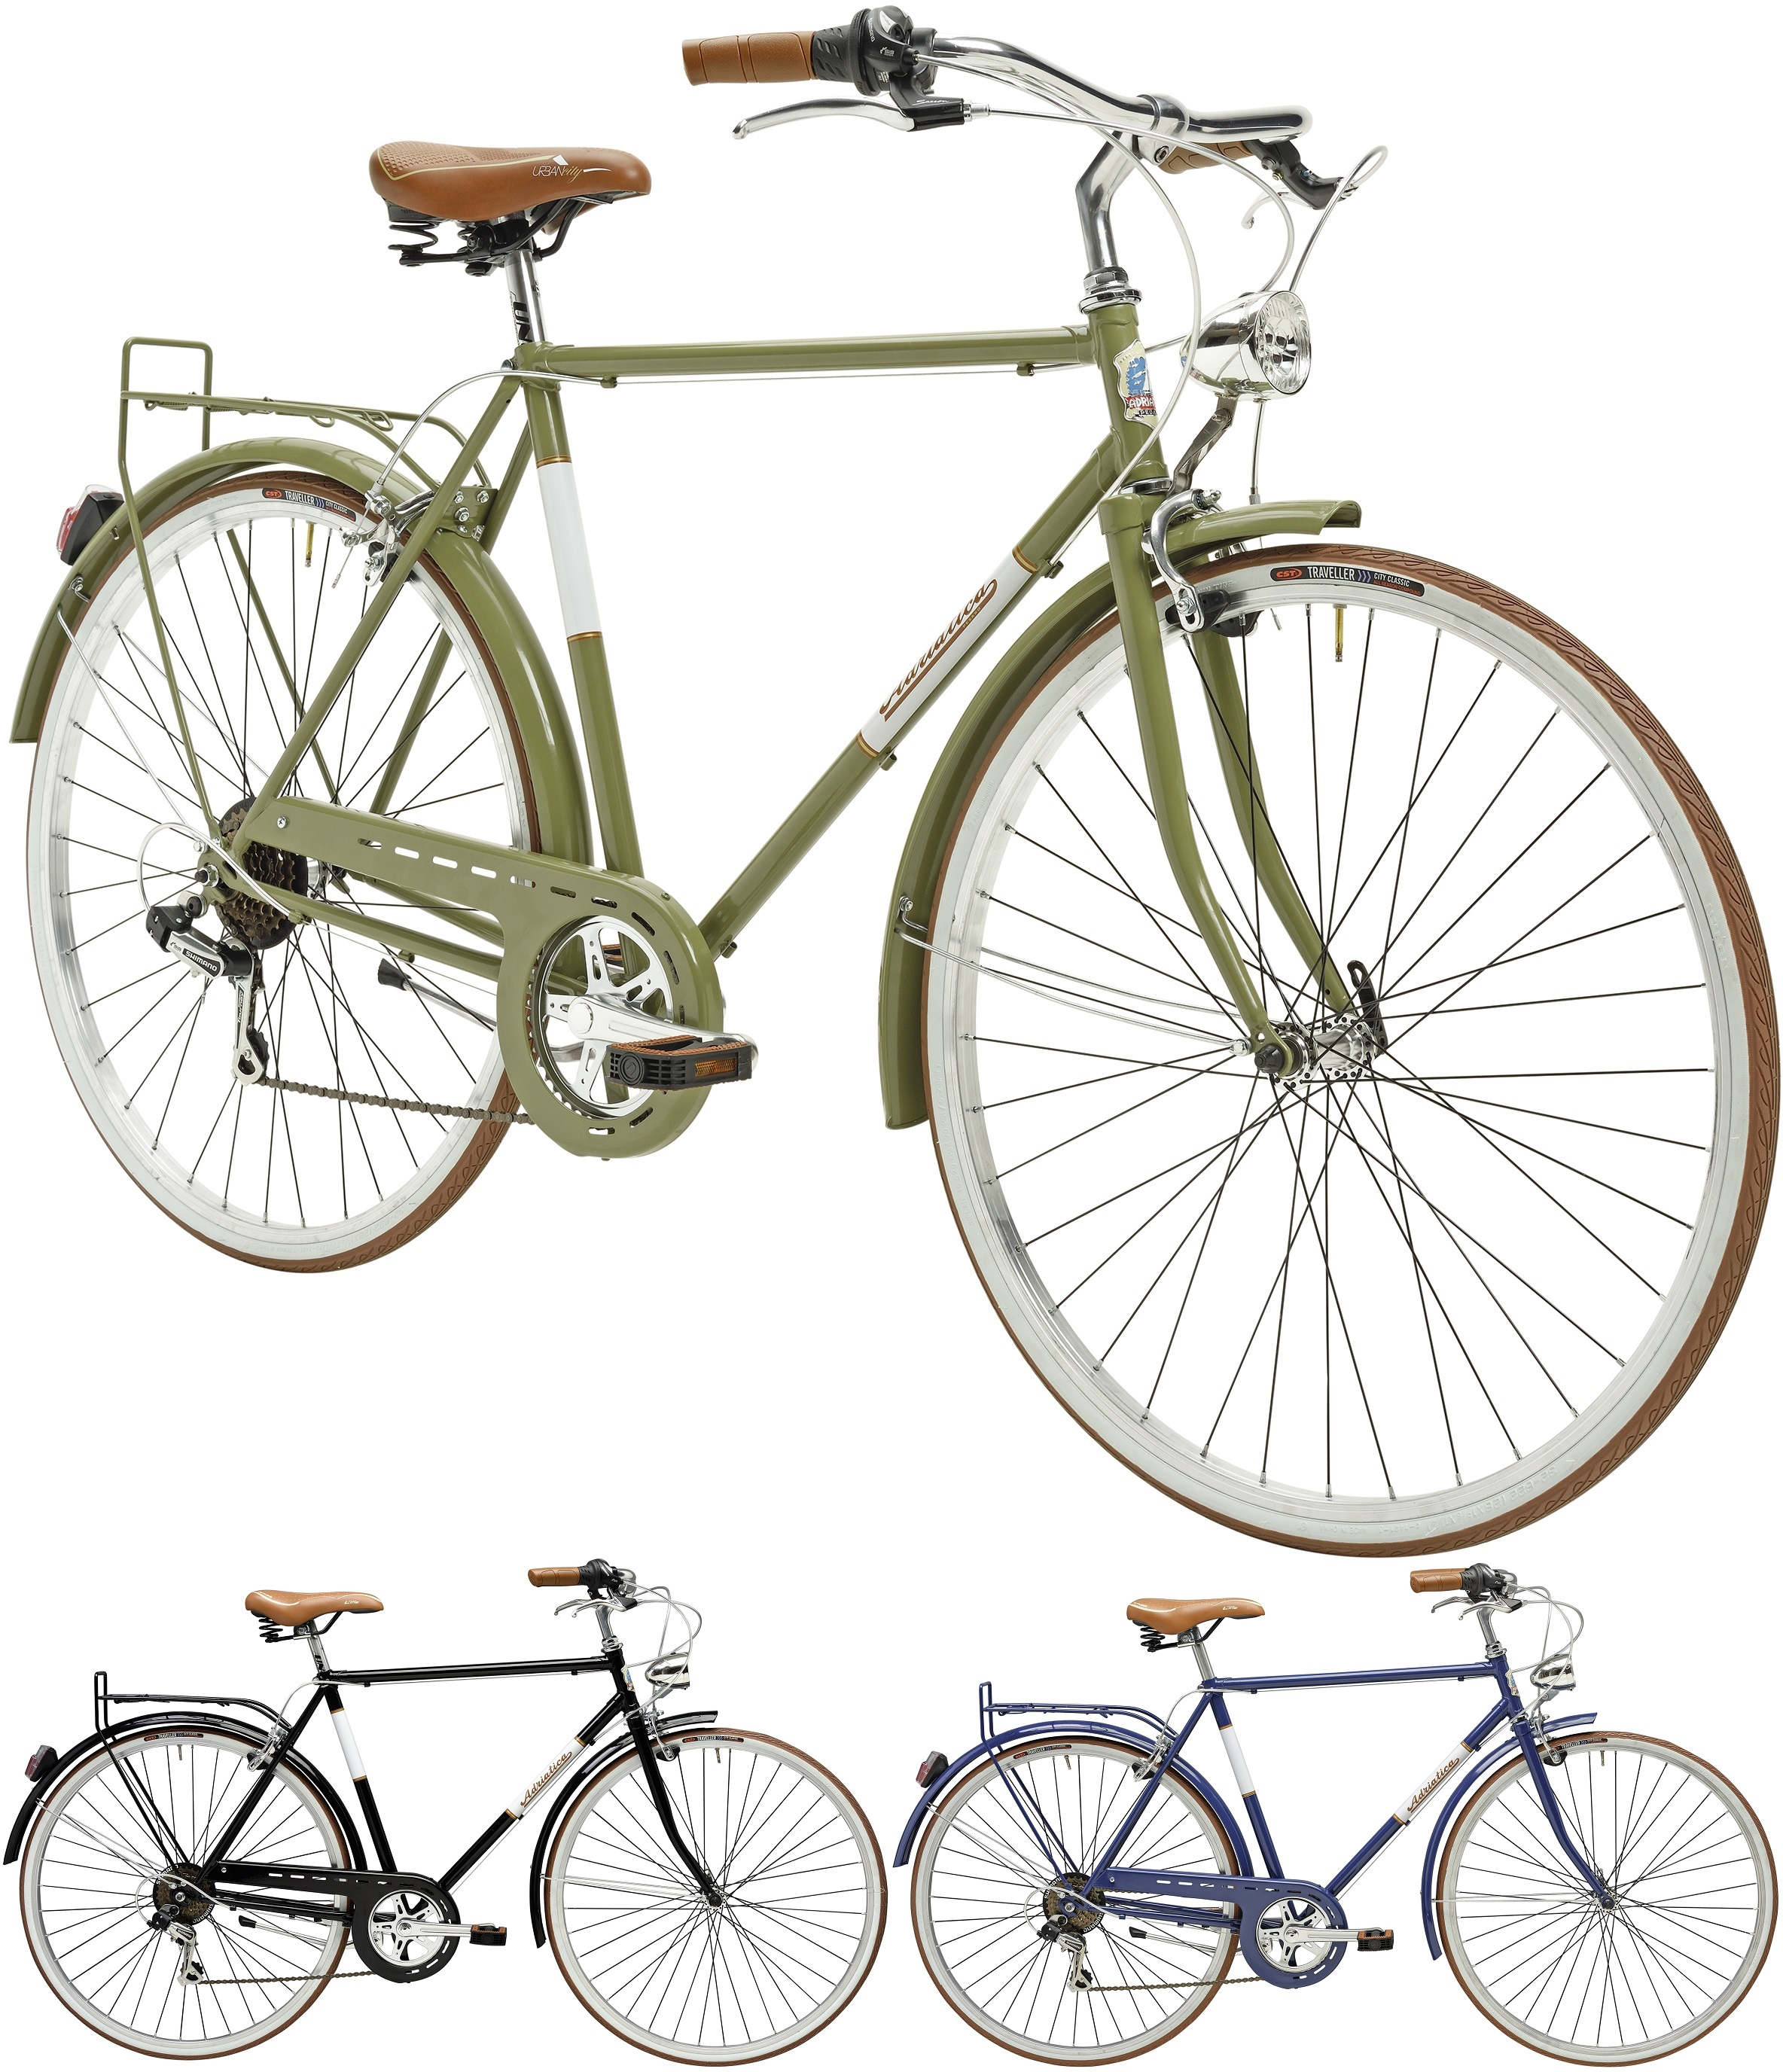 28 zoll herren city fahrrad adriatica condorino 6 gang. Black Bedroom Furniture Sets. Home Design Ideas